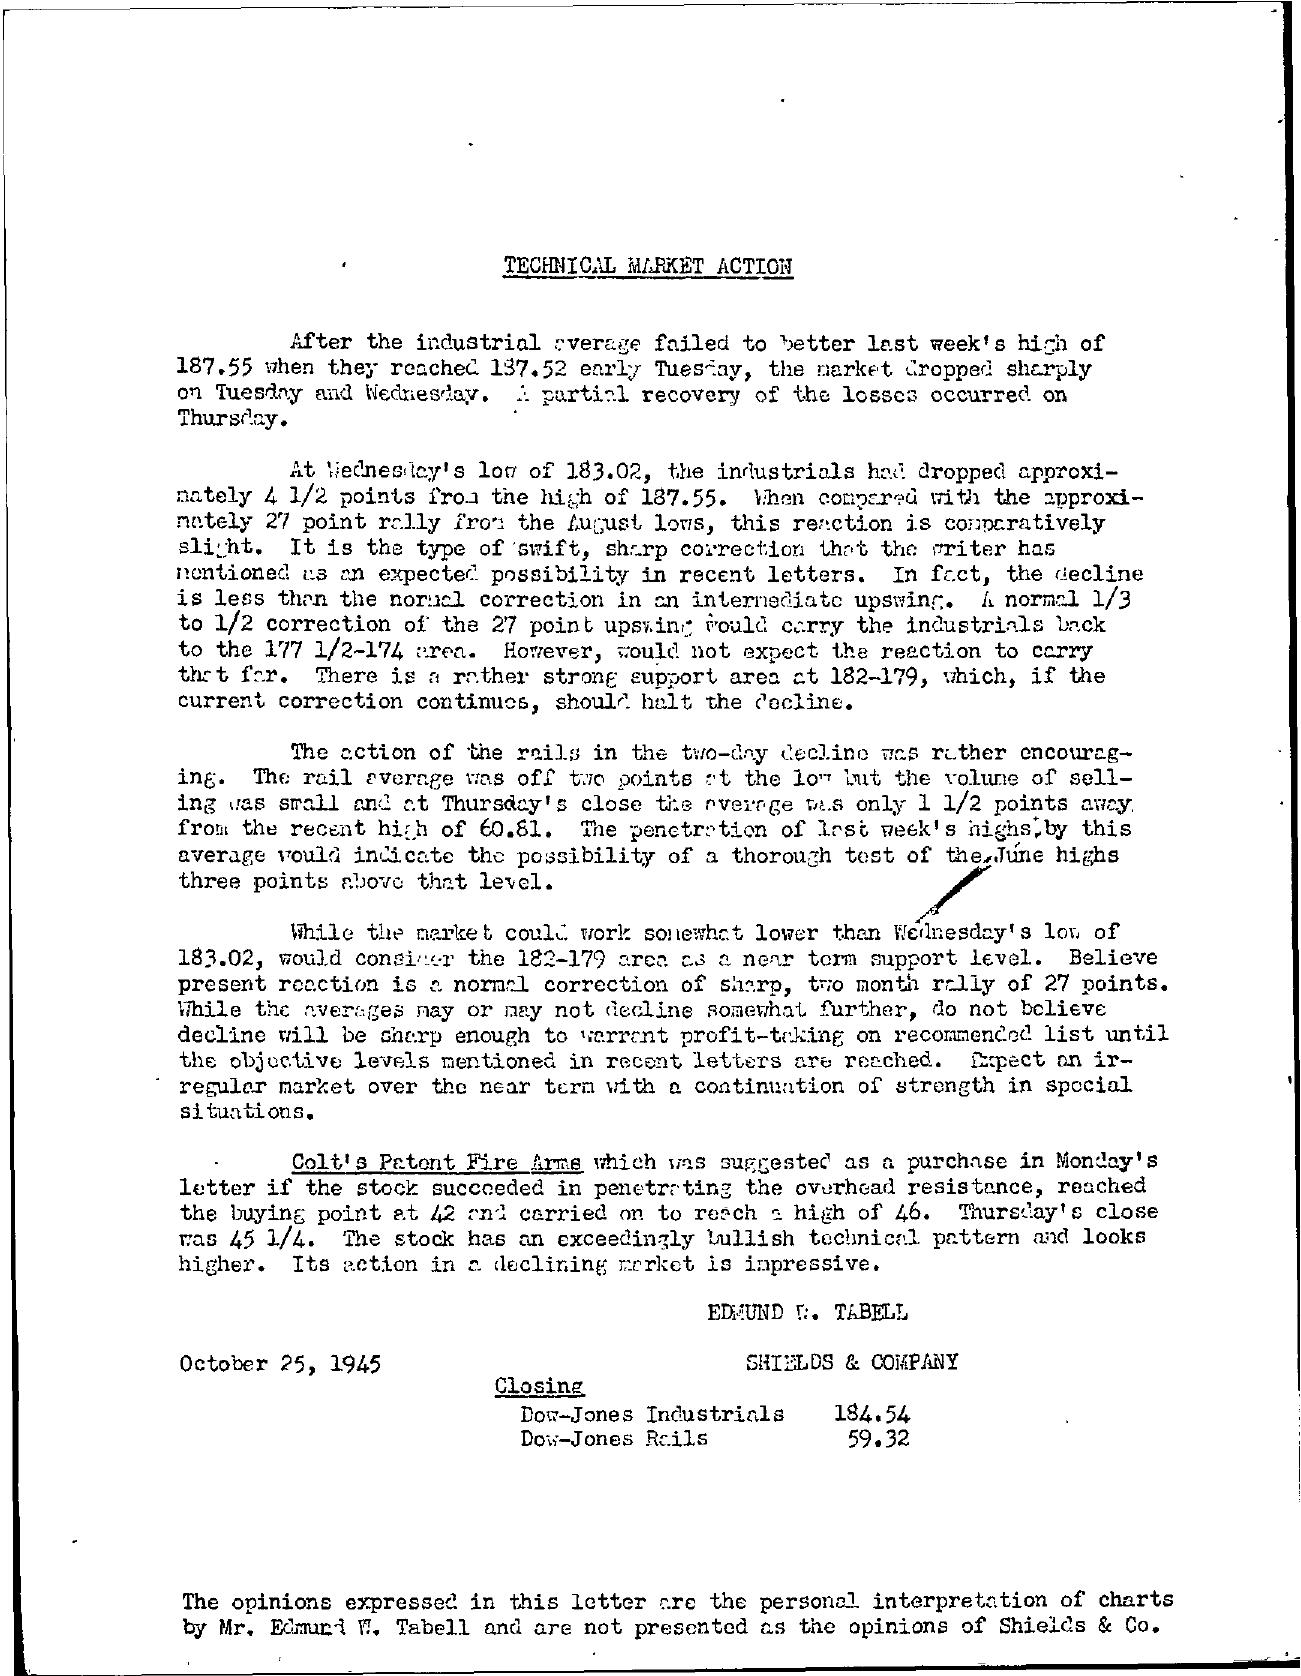 Tabell's Market Letter - October 25, 1945